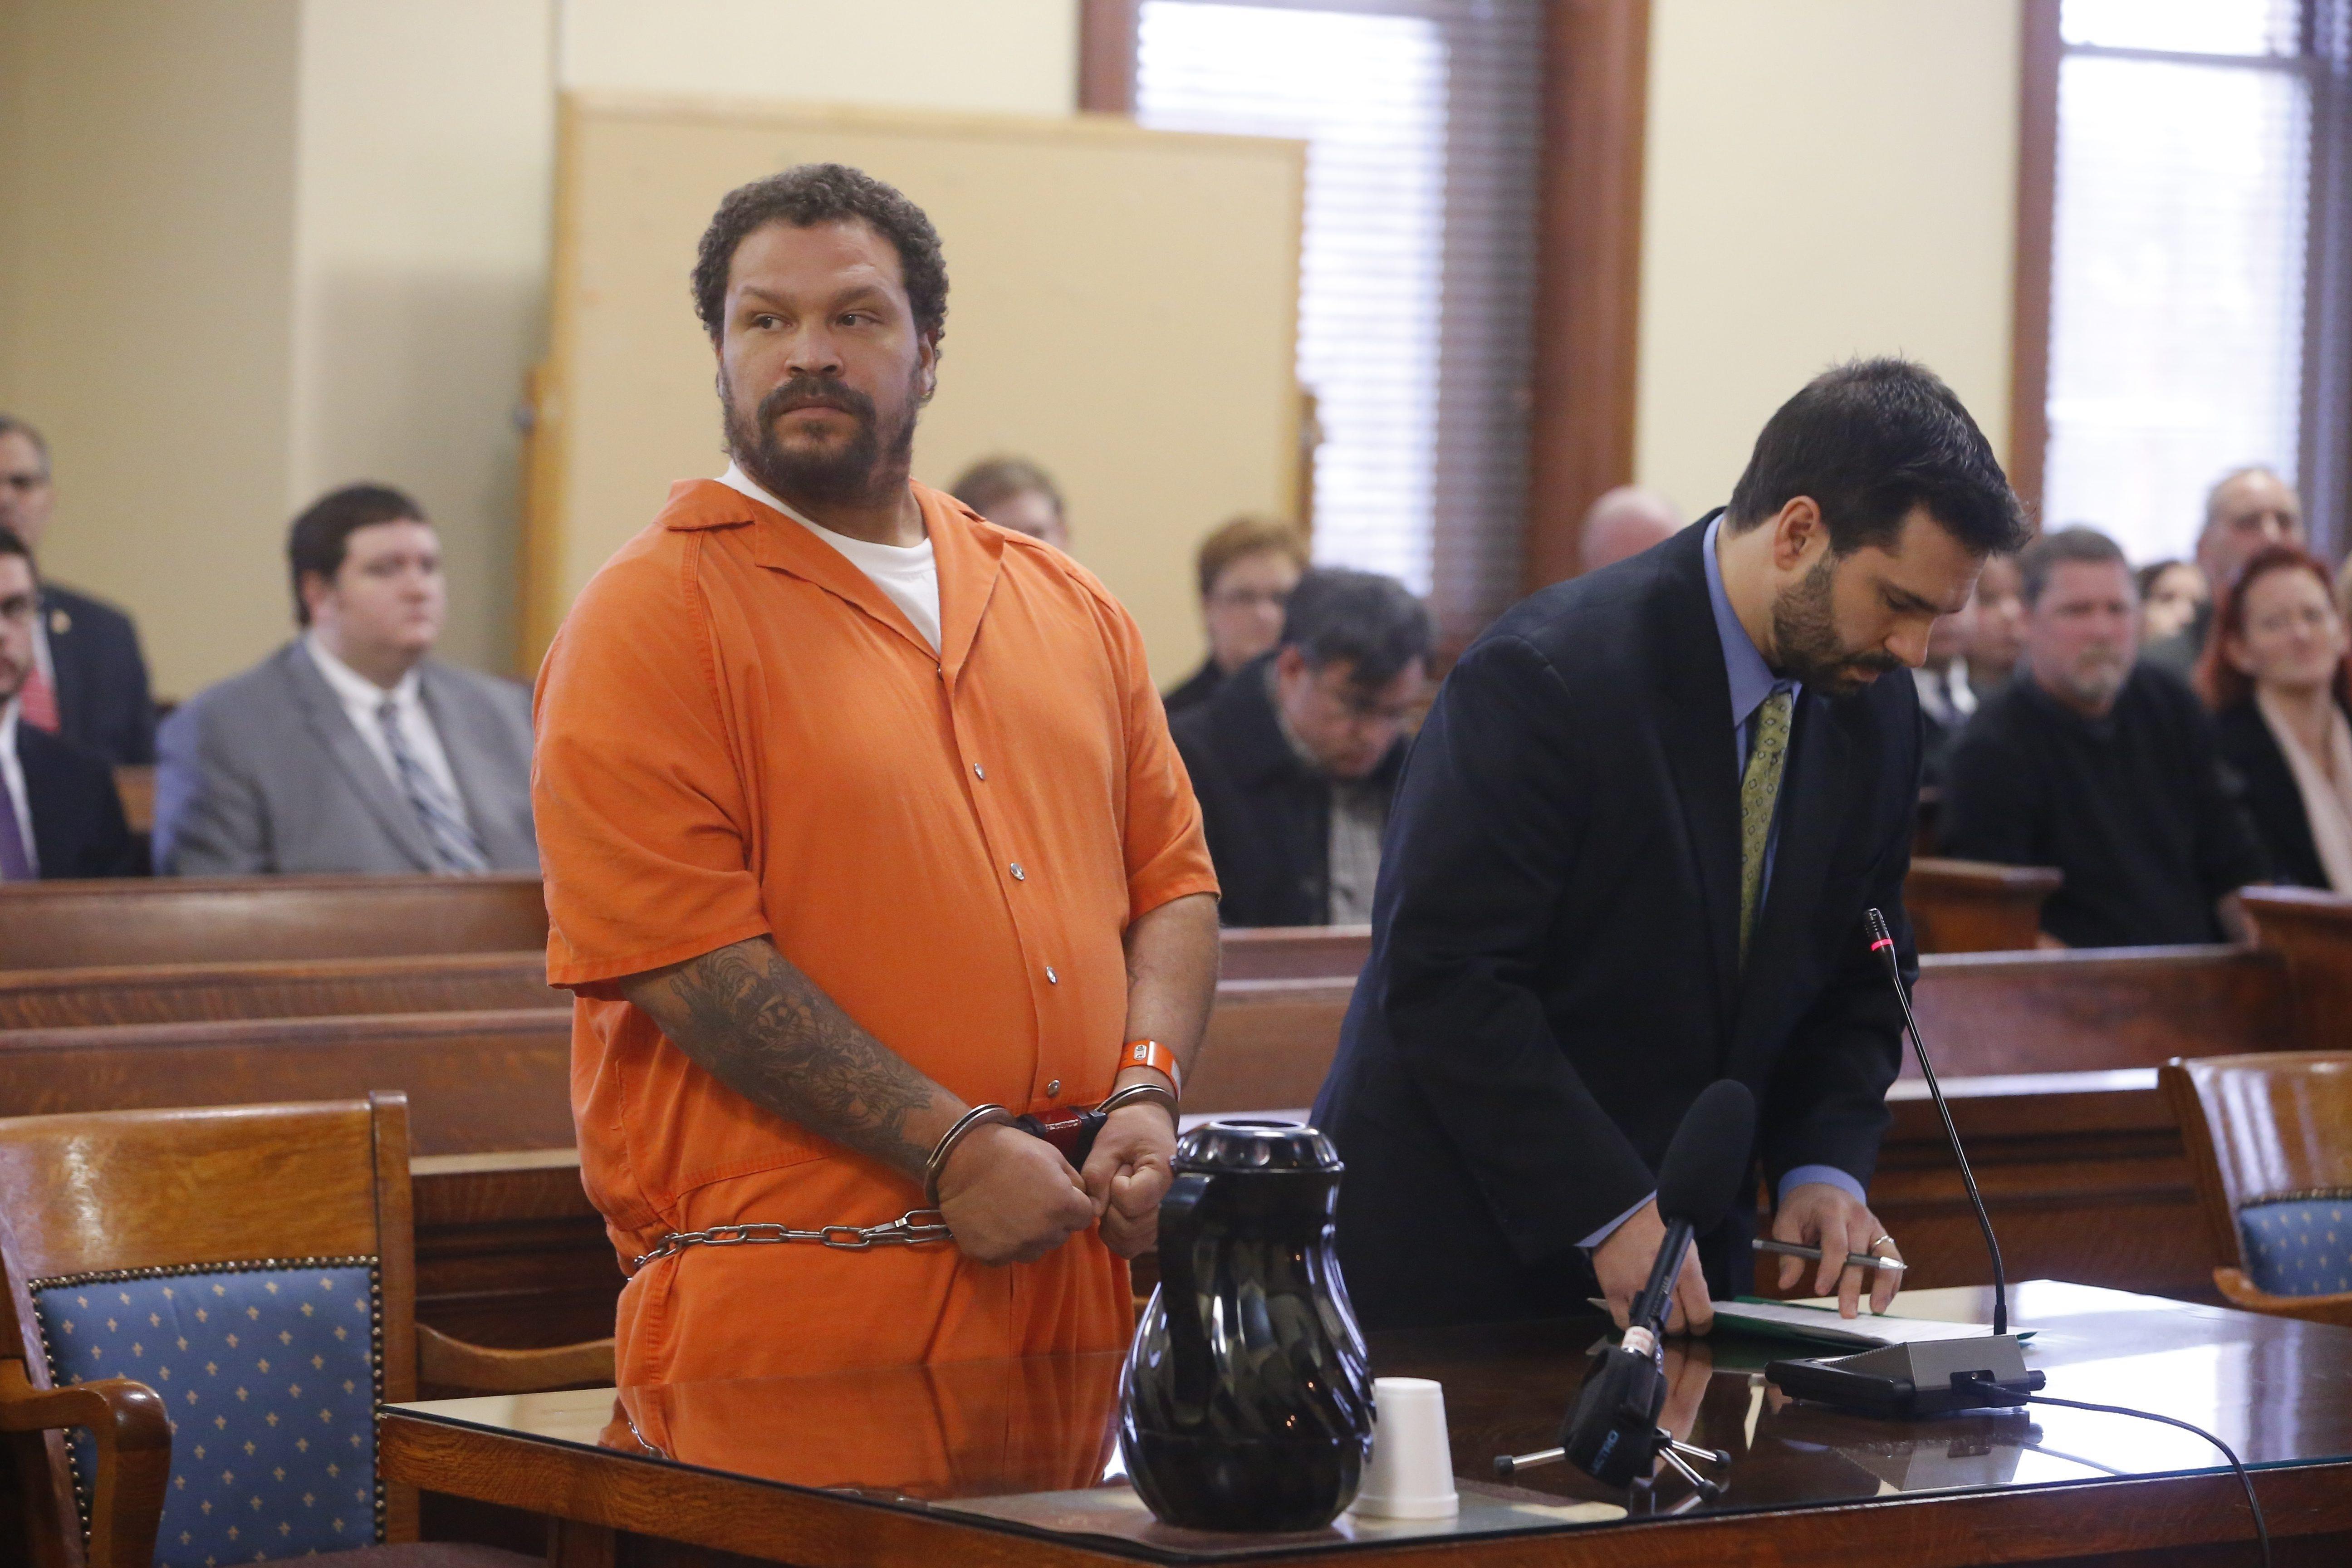 "Andre L. Jenkins, left, is serving prison sentence of life without parole in the September 2014 murders of fellow Kingsmen motorclycle club members Daniel ""DJ"" Szy- manski, center, and Paul Maue in North Tonawanda."